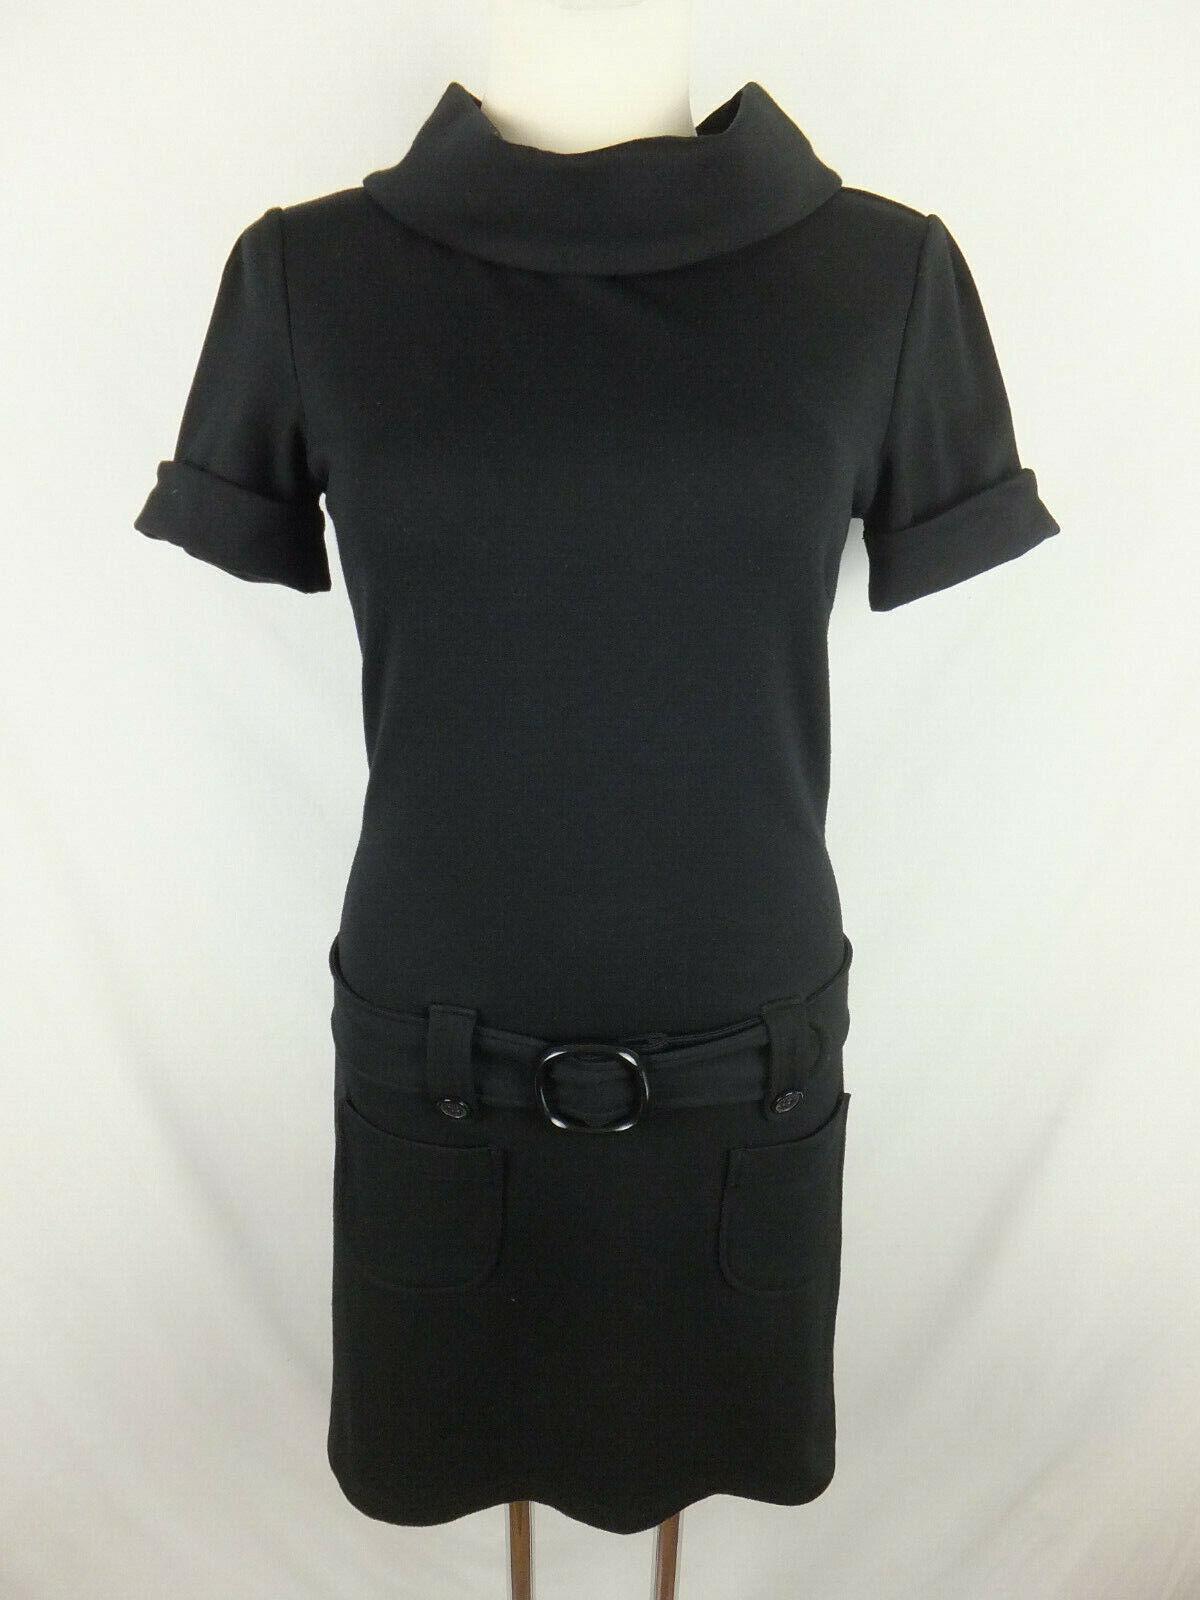 Hallhuber Basics sweatkleid - 36-S-Black Dress-Shirt Dress-Excellent Condition